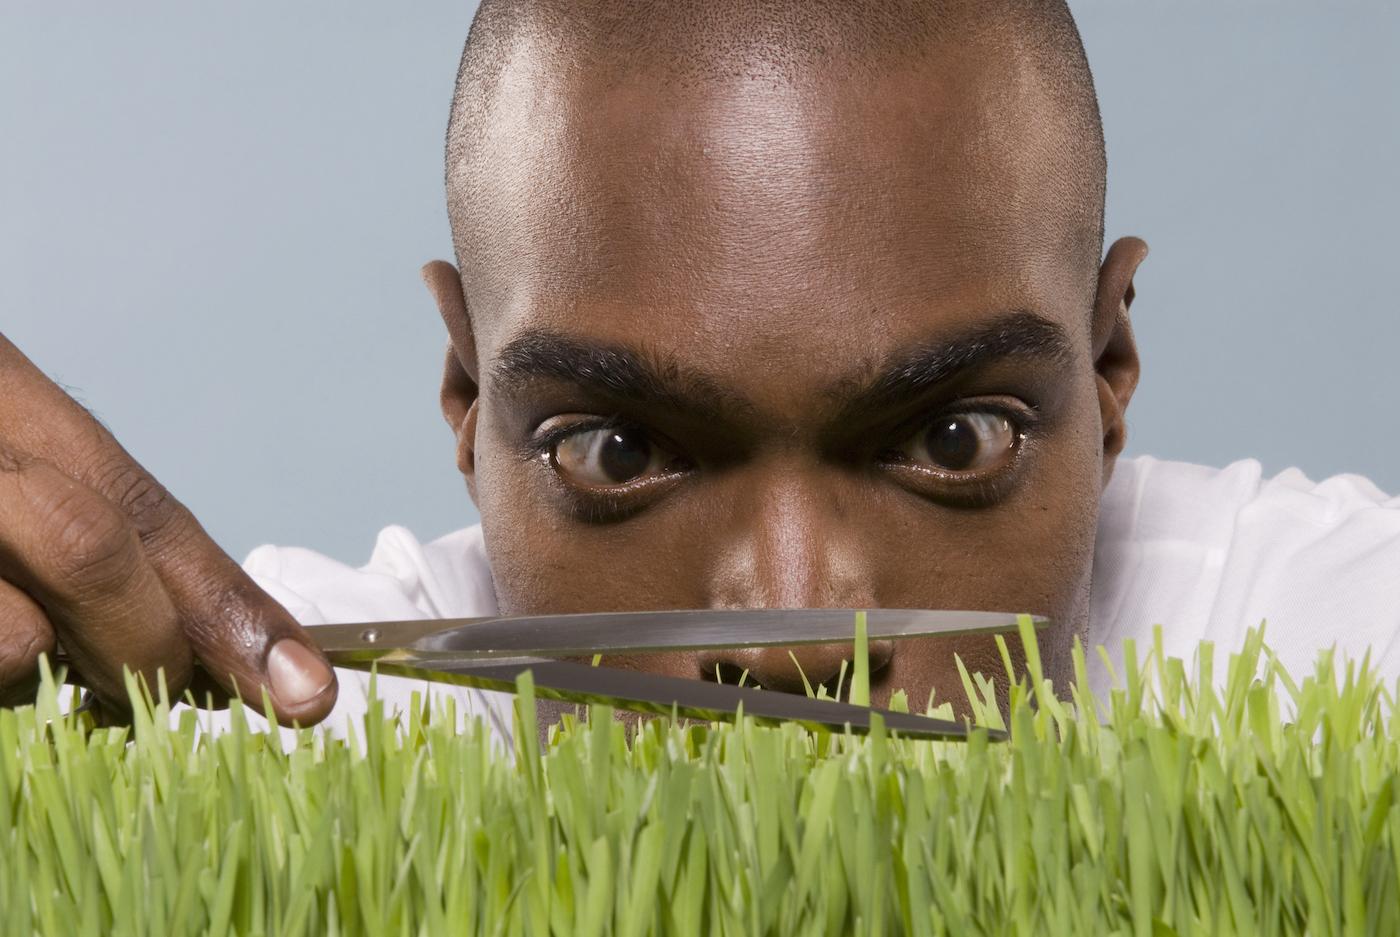 Man cutting wheatgrass with scissor, close-up